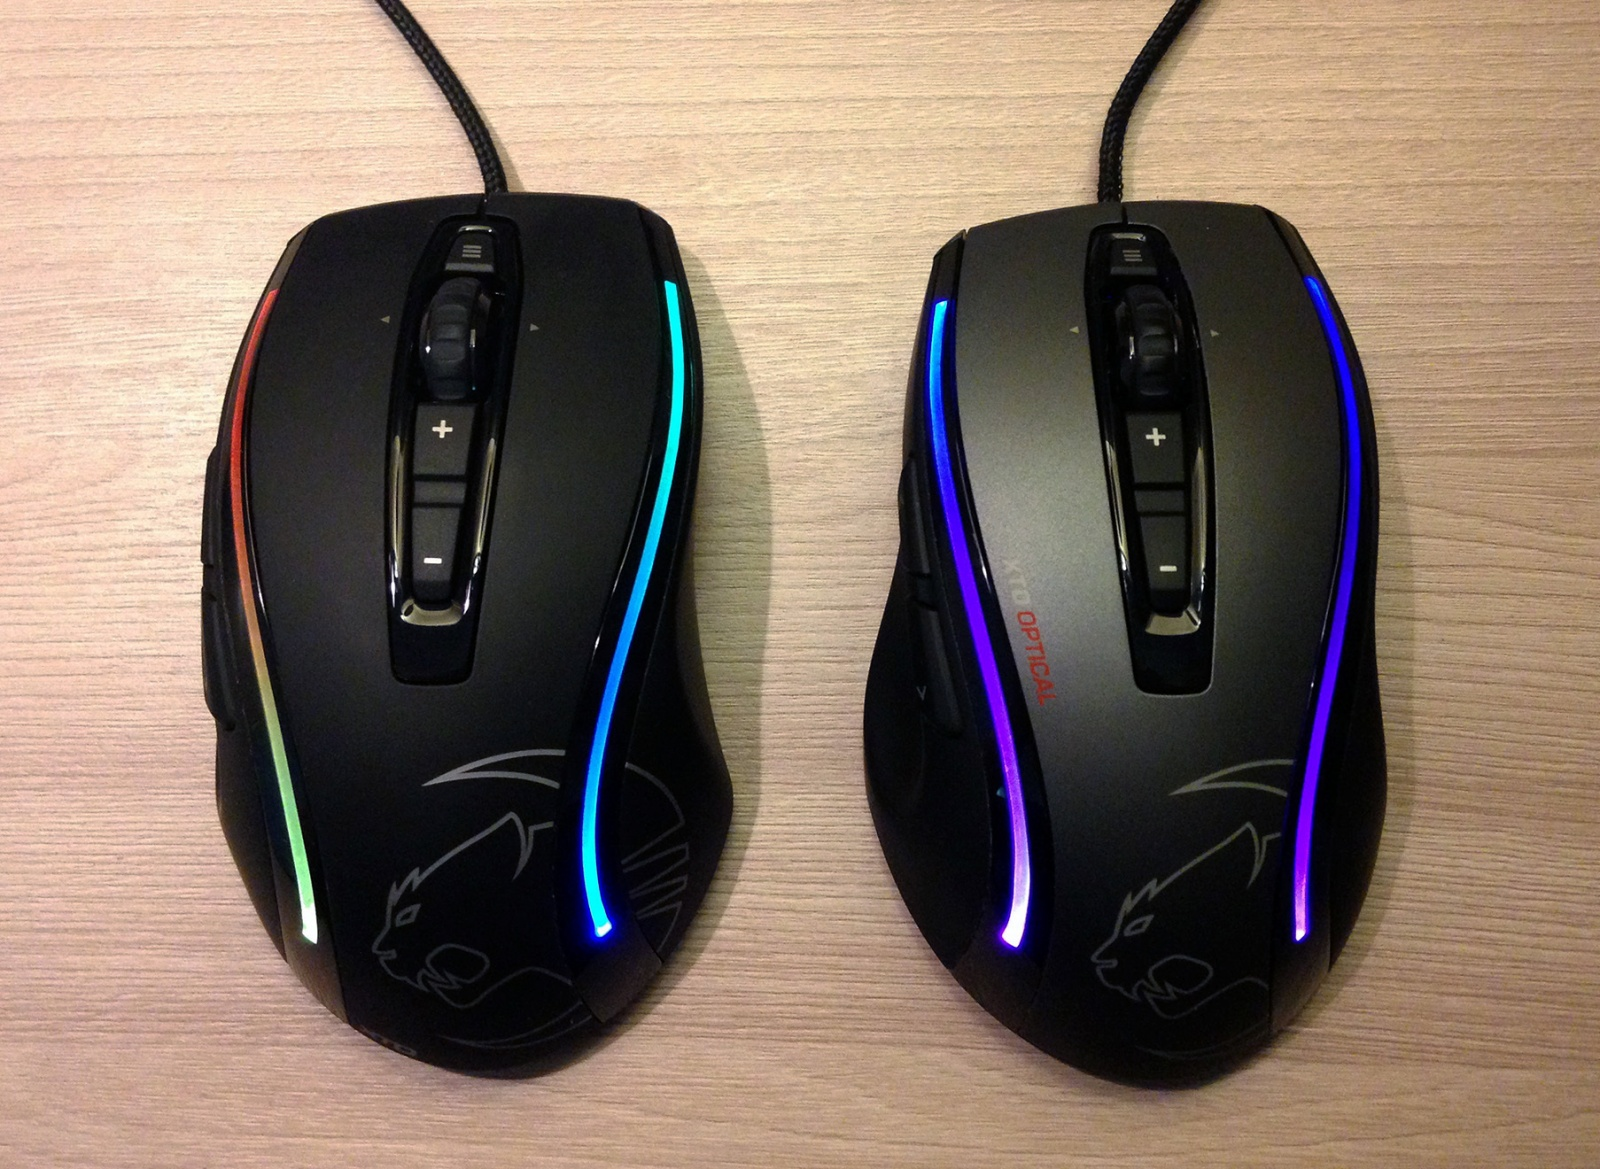 Мышки топ-сегмента – Roccat Kone XTD и Roccat Kone XTD Optical - 2